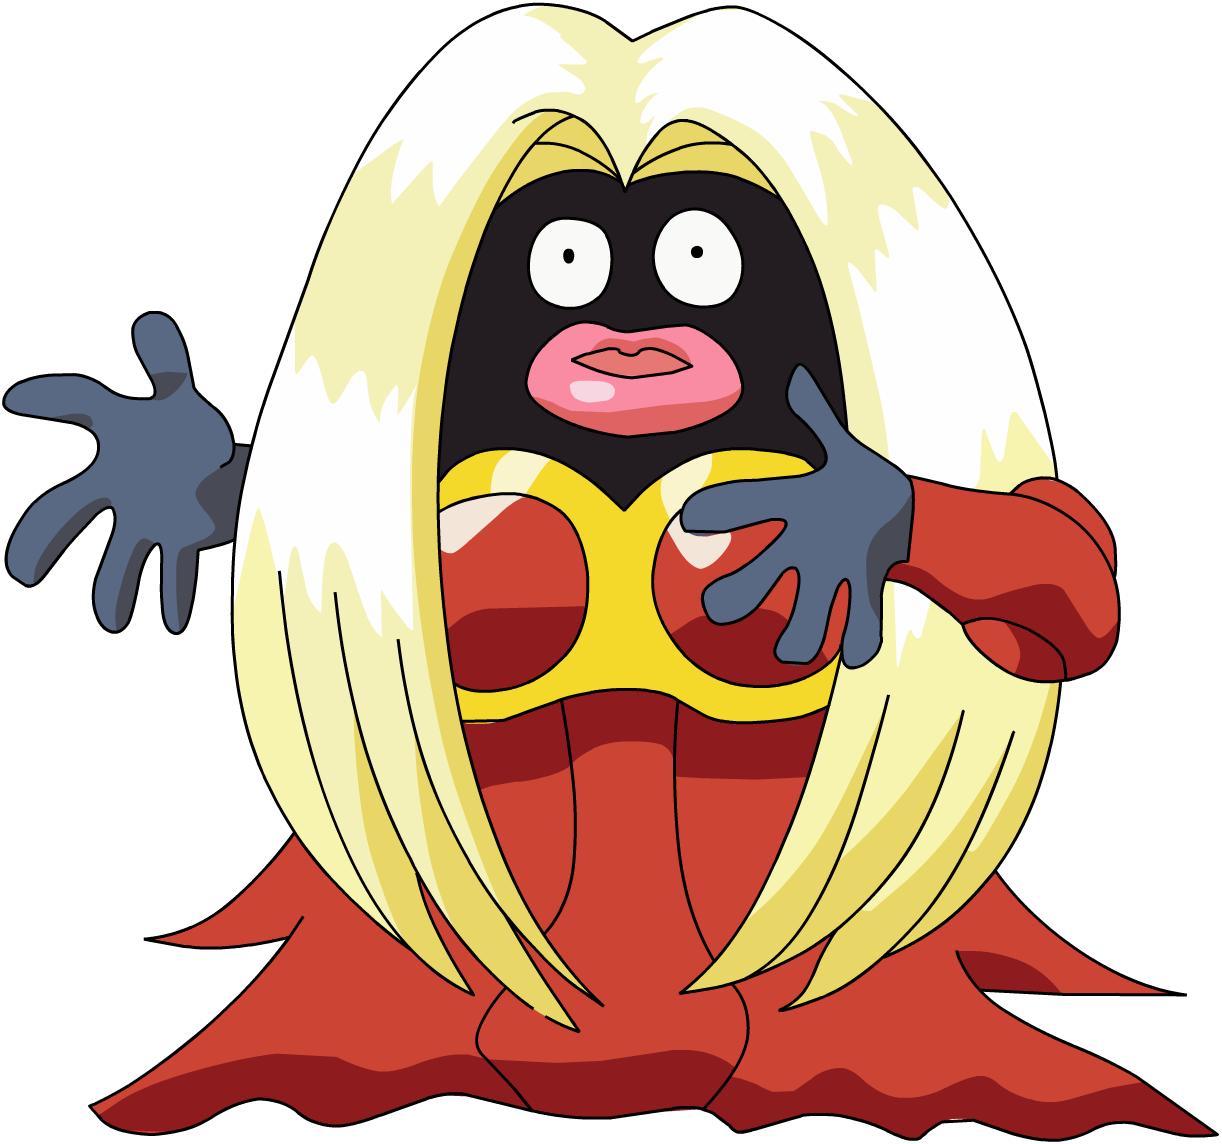 http://vignette2.wikia.nocookie.net/sonic-pokemon-unipedia/images/d/dd/144-1.png/revision/latest?cb=20140430155108